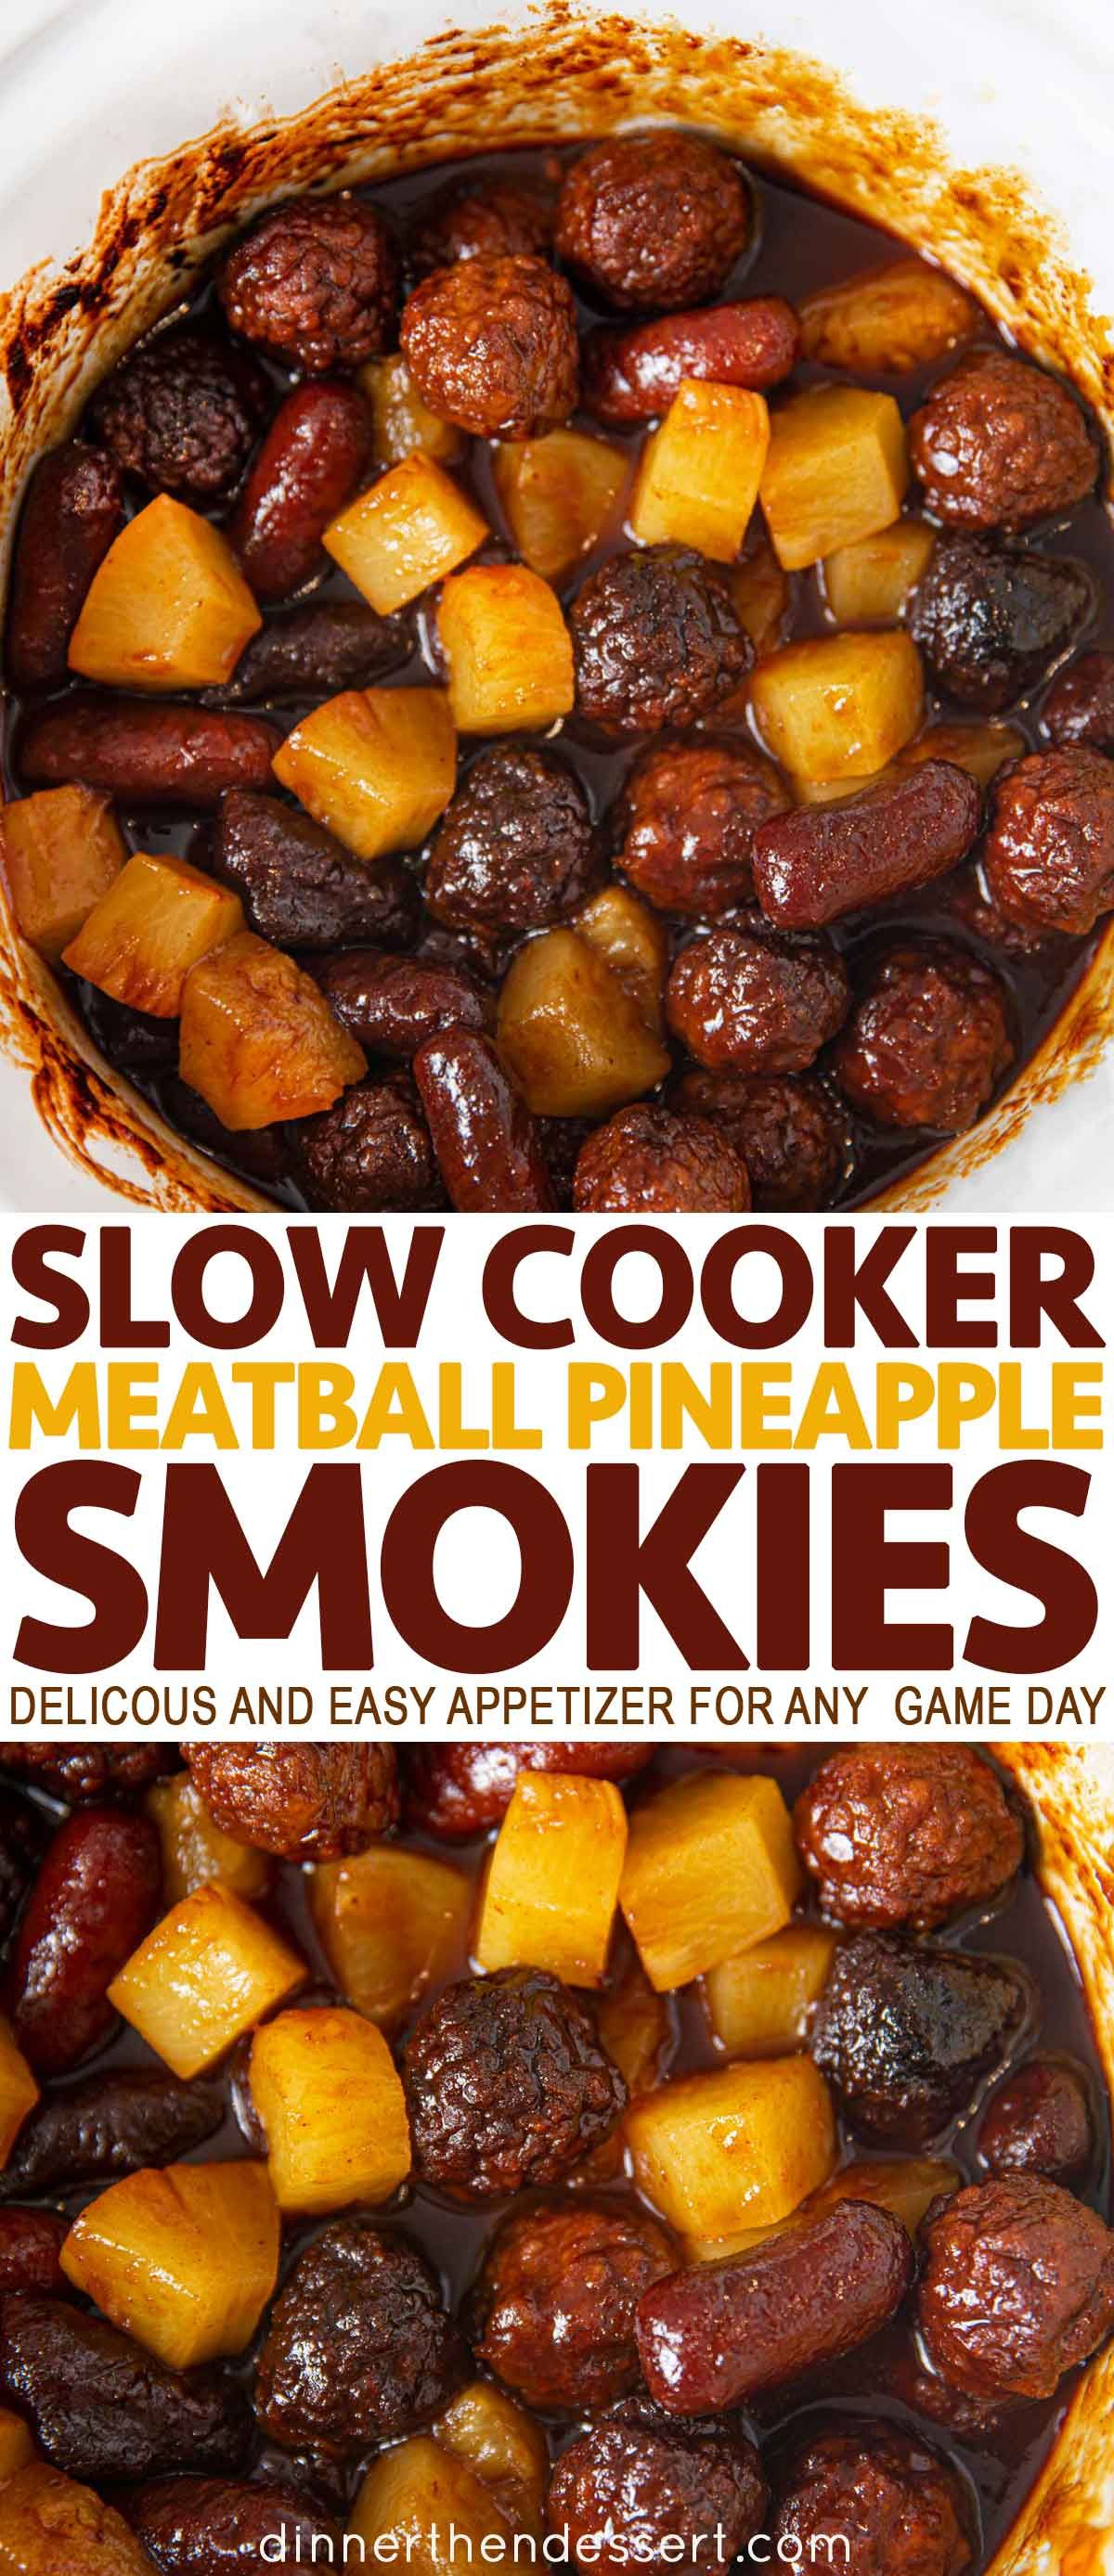 Photo of Slow Cooker Meatball Pineapple Smokies Recipe – Dinner, then Dessert